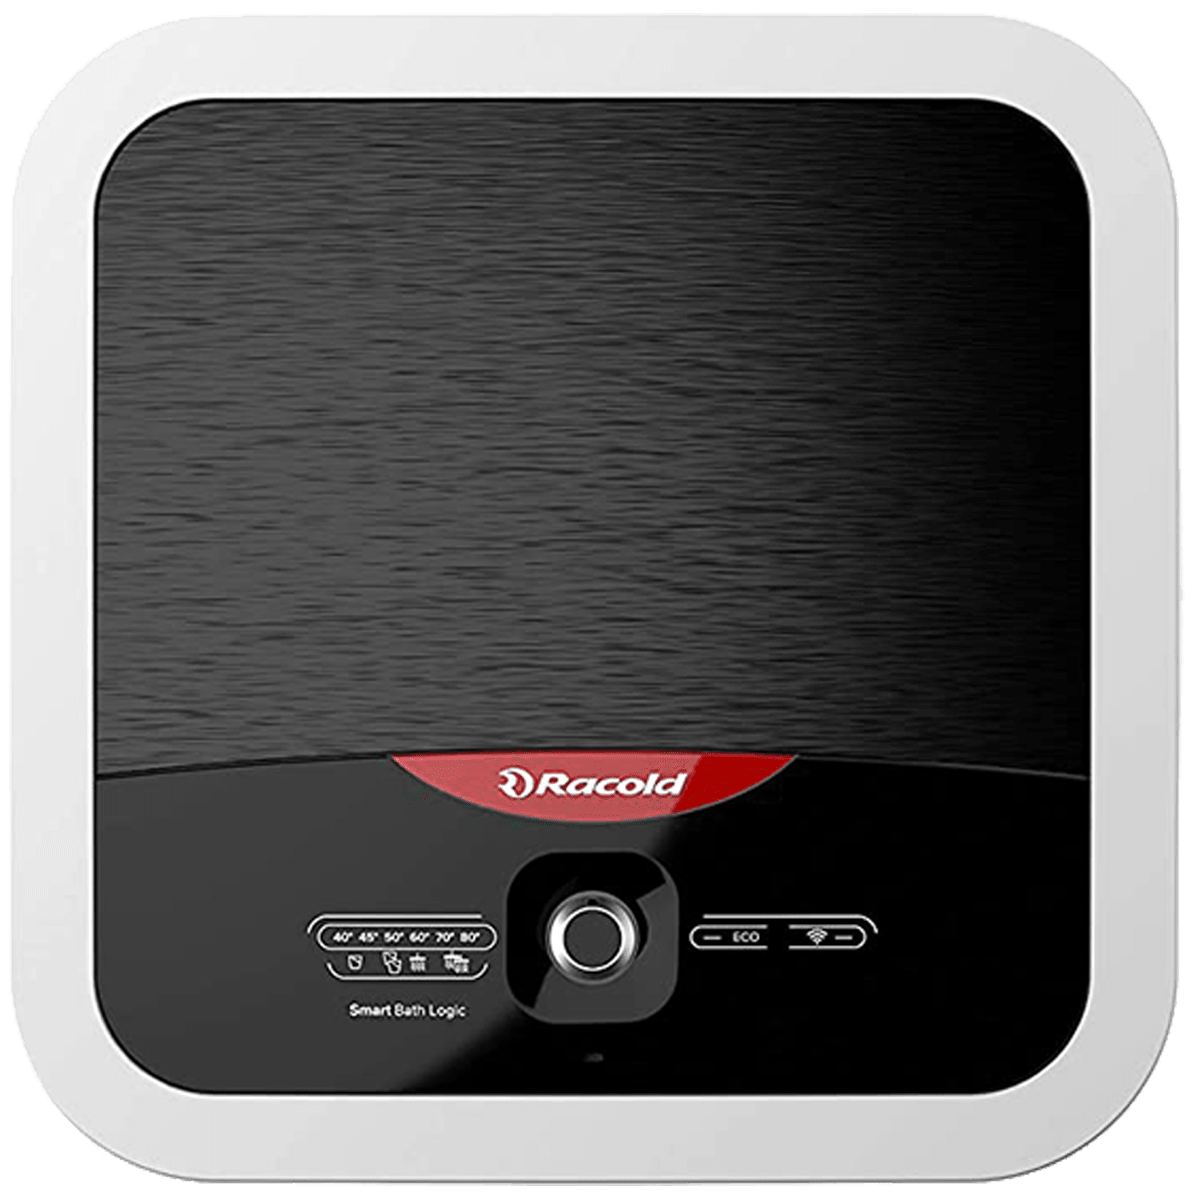 Racold Omnis Wi-Fi 25 Litres 5 Star Storage Water Geyser (2000 Watts, Black/Grey)